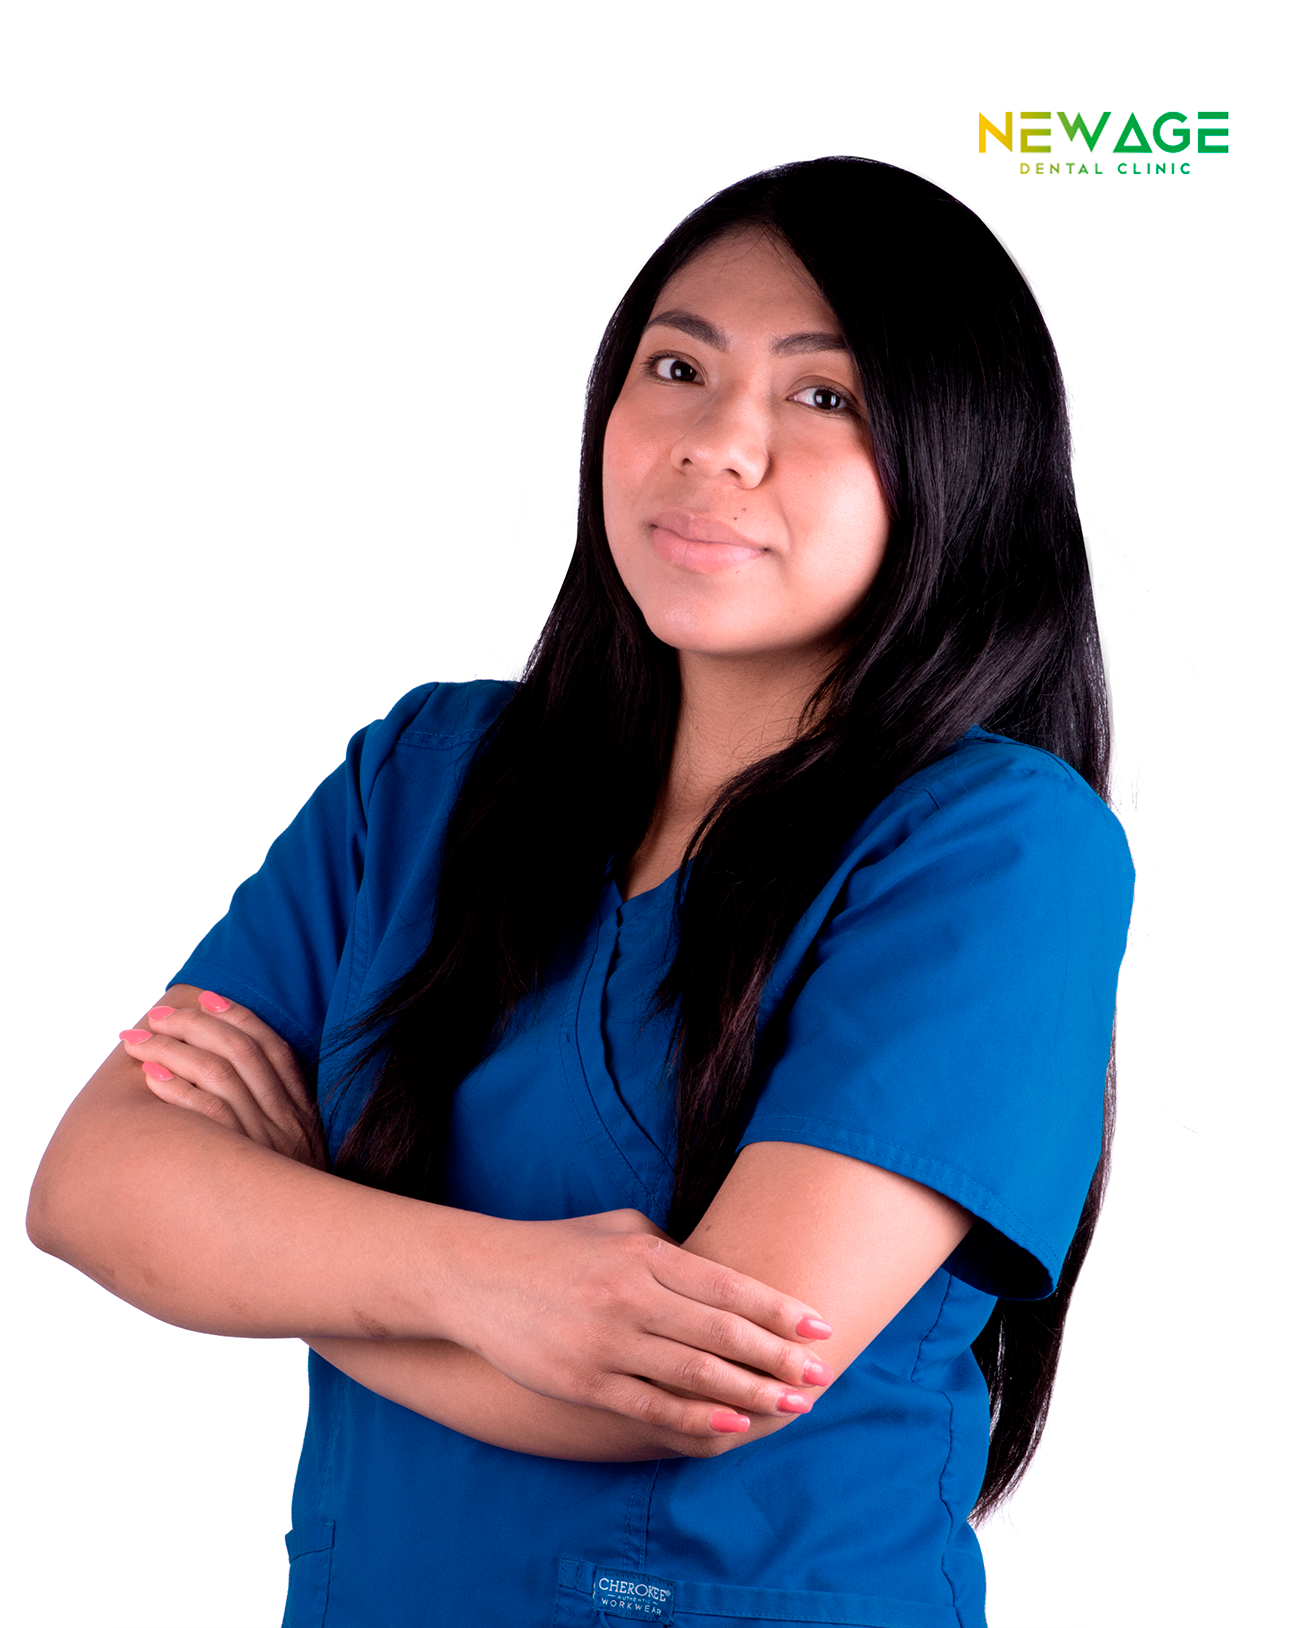 Estefany Mendoza, patient coordinator at New Age Dental Clinic in Tijuana